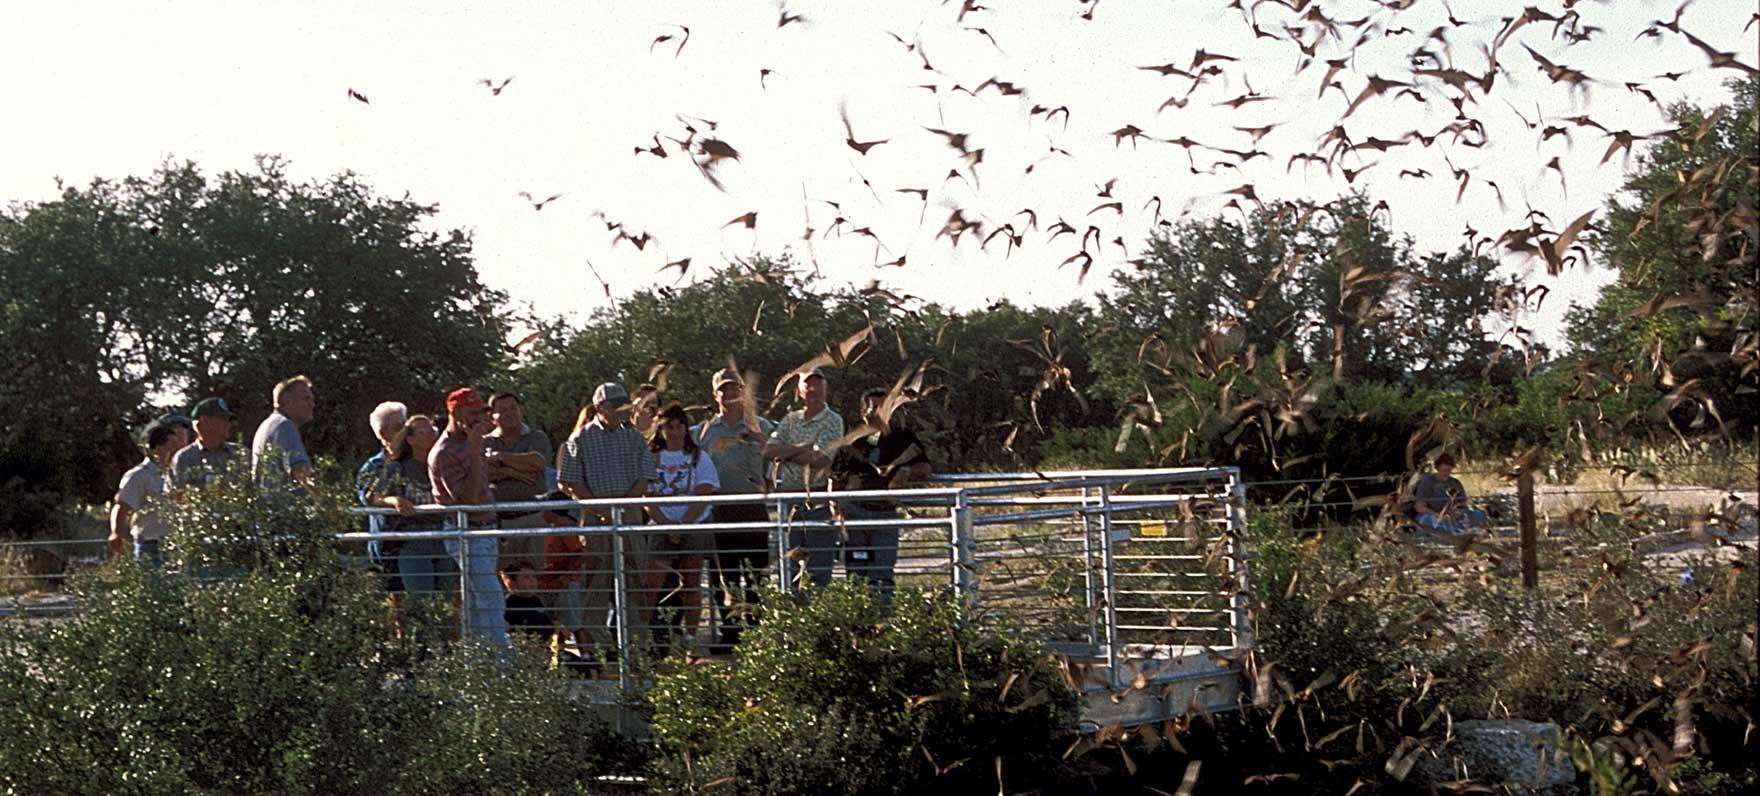 Devils Sinkhole State Natural Area  Texas Parks